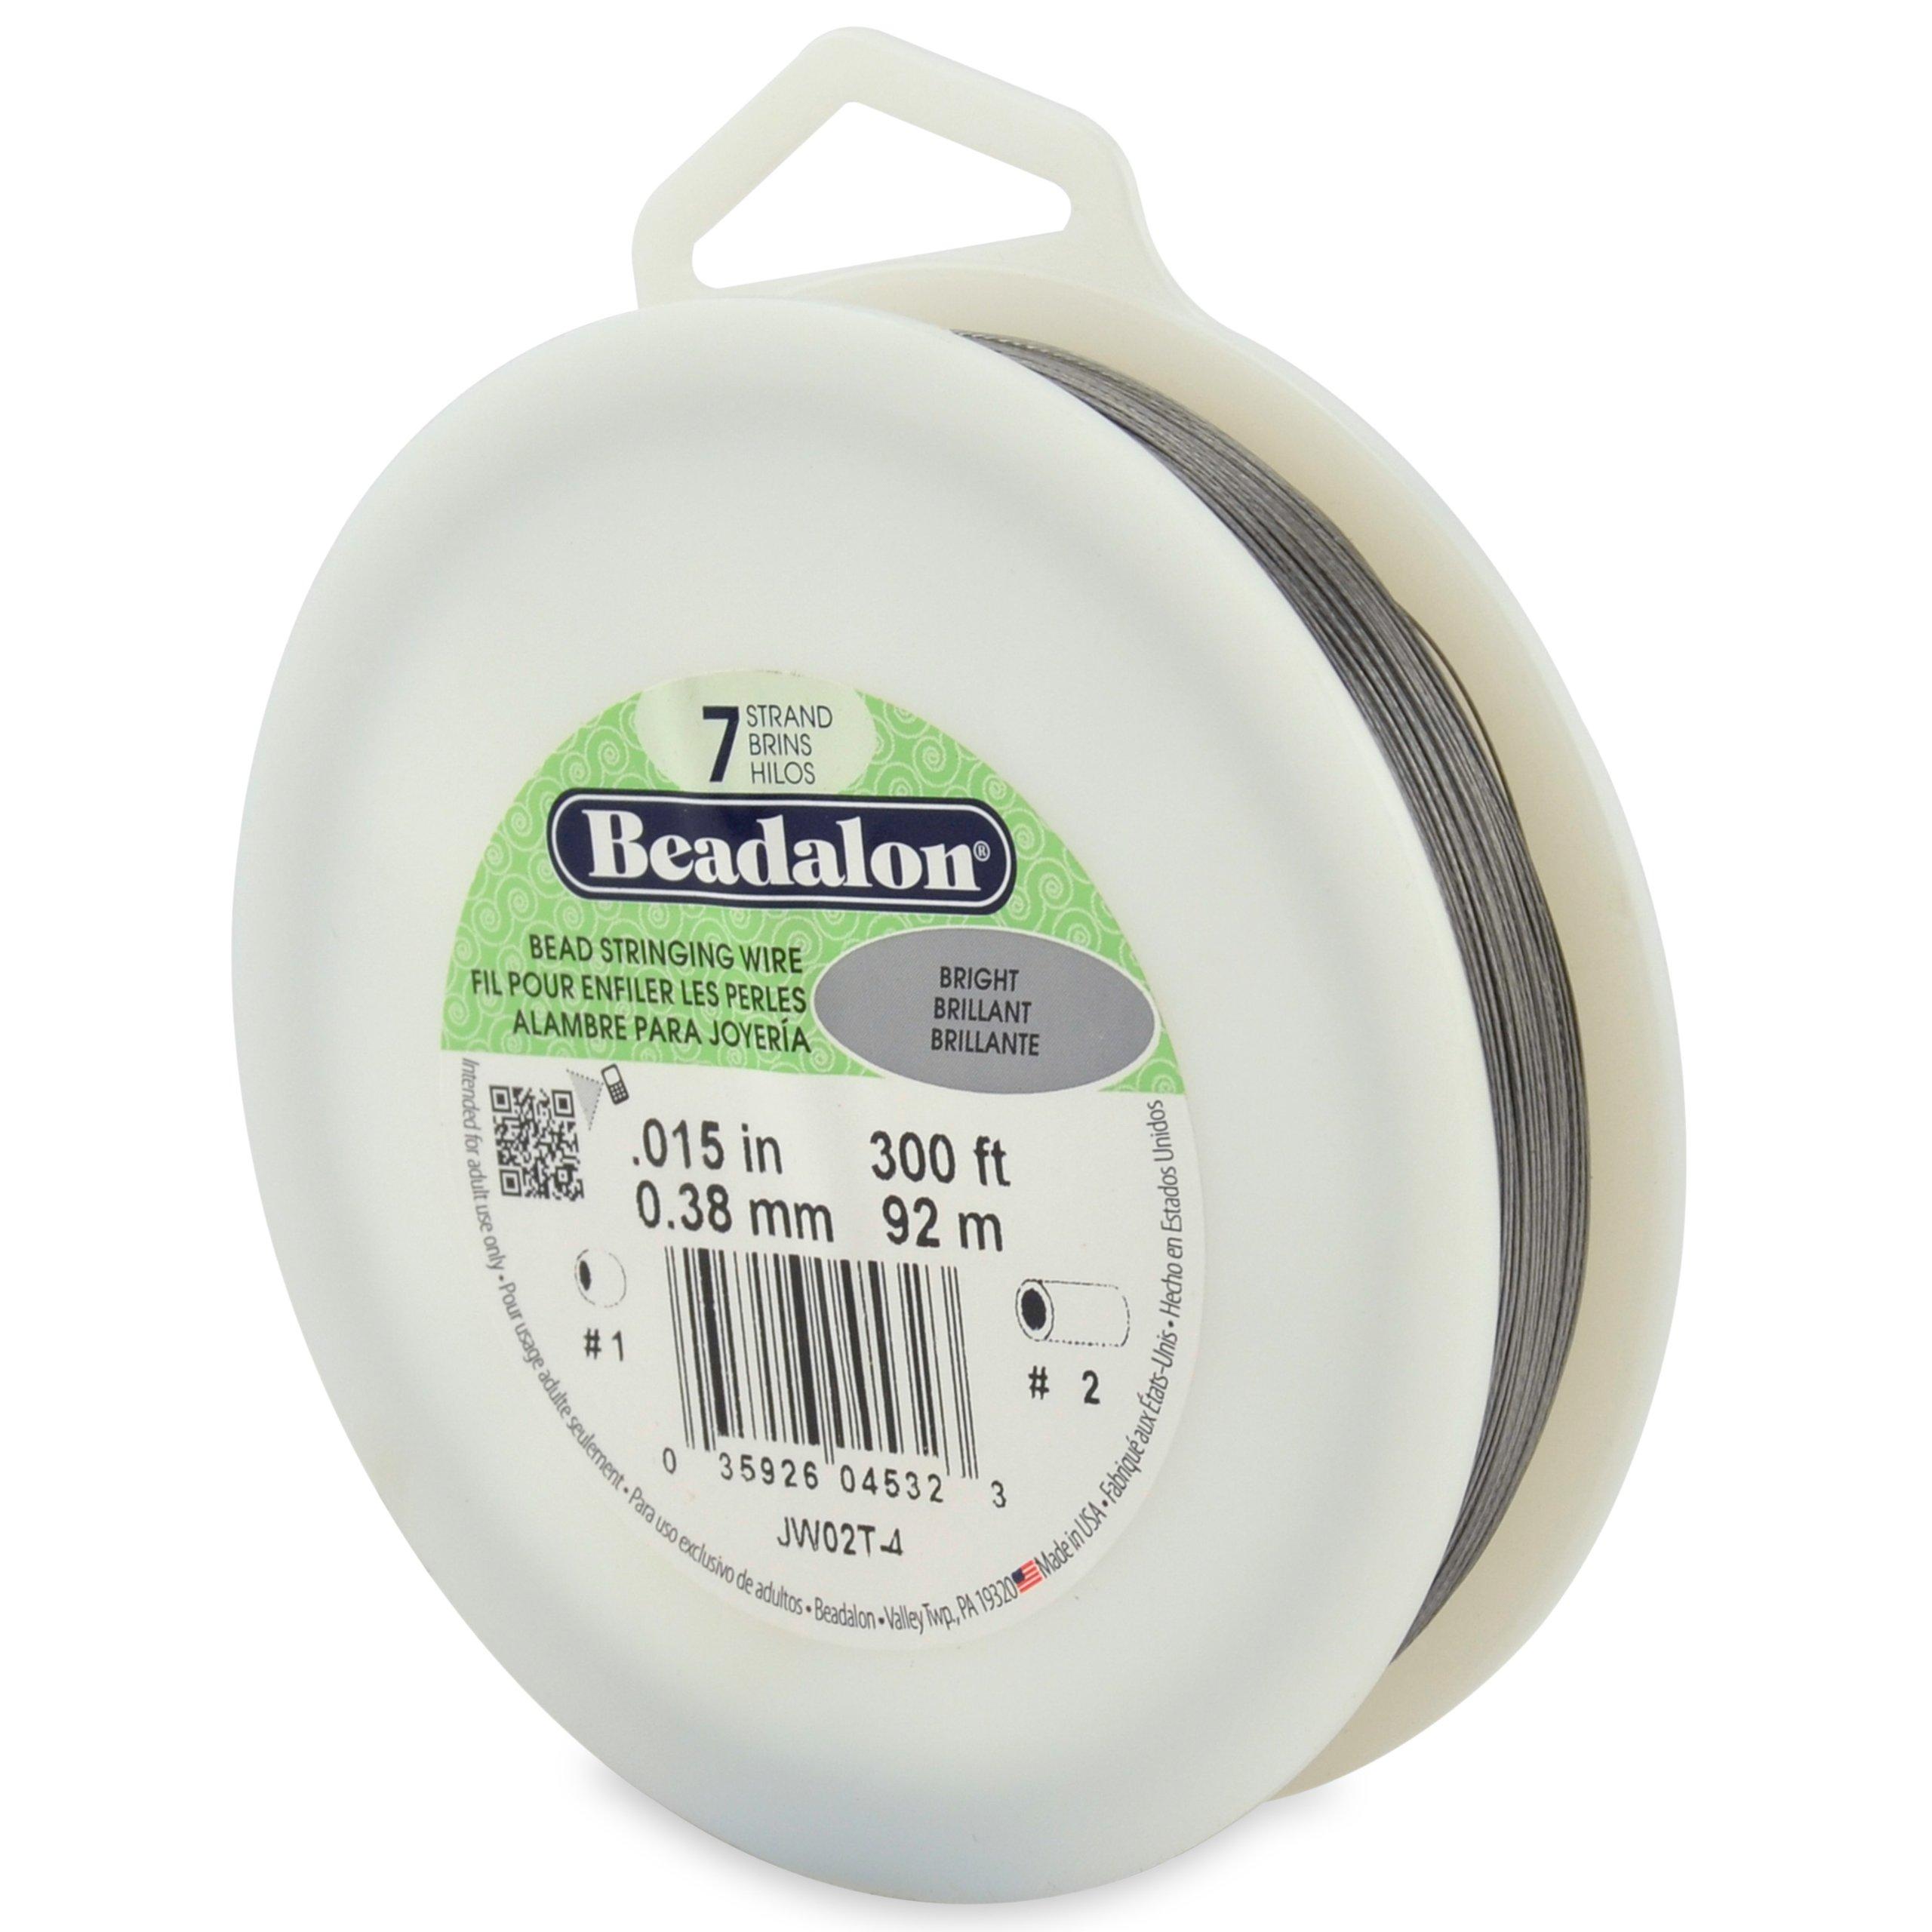 Beadalon 7-Strand 0.015'' (0.38 mm) 300 ft (91.4 m) Bright Bead Stringing Wire, by Beadalon